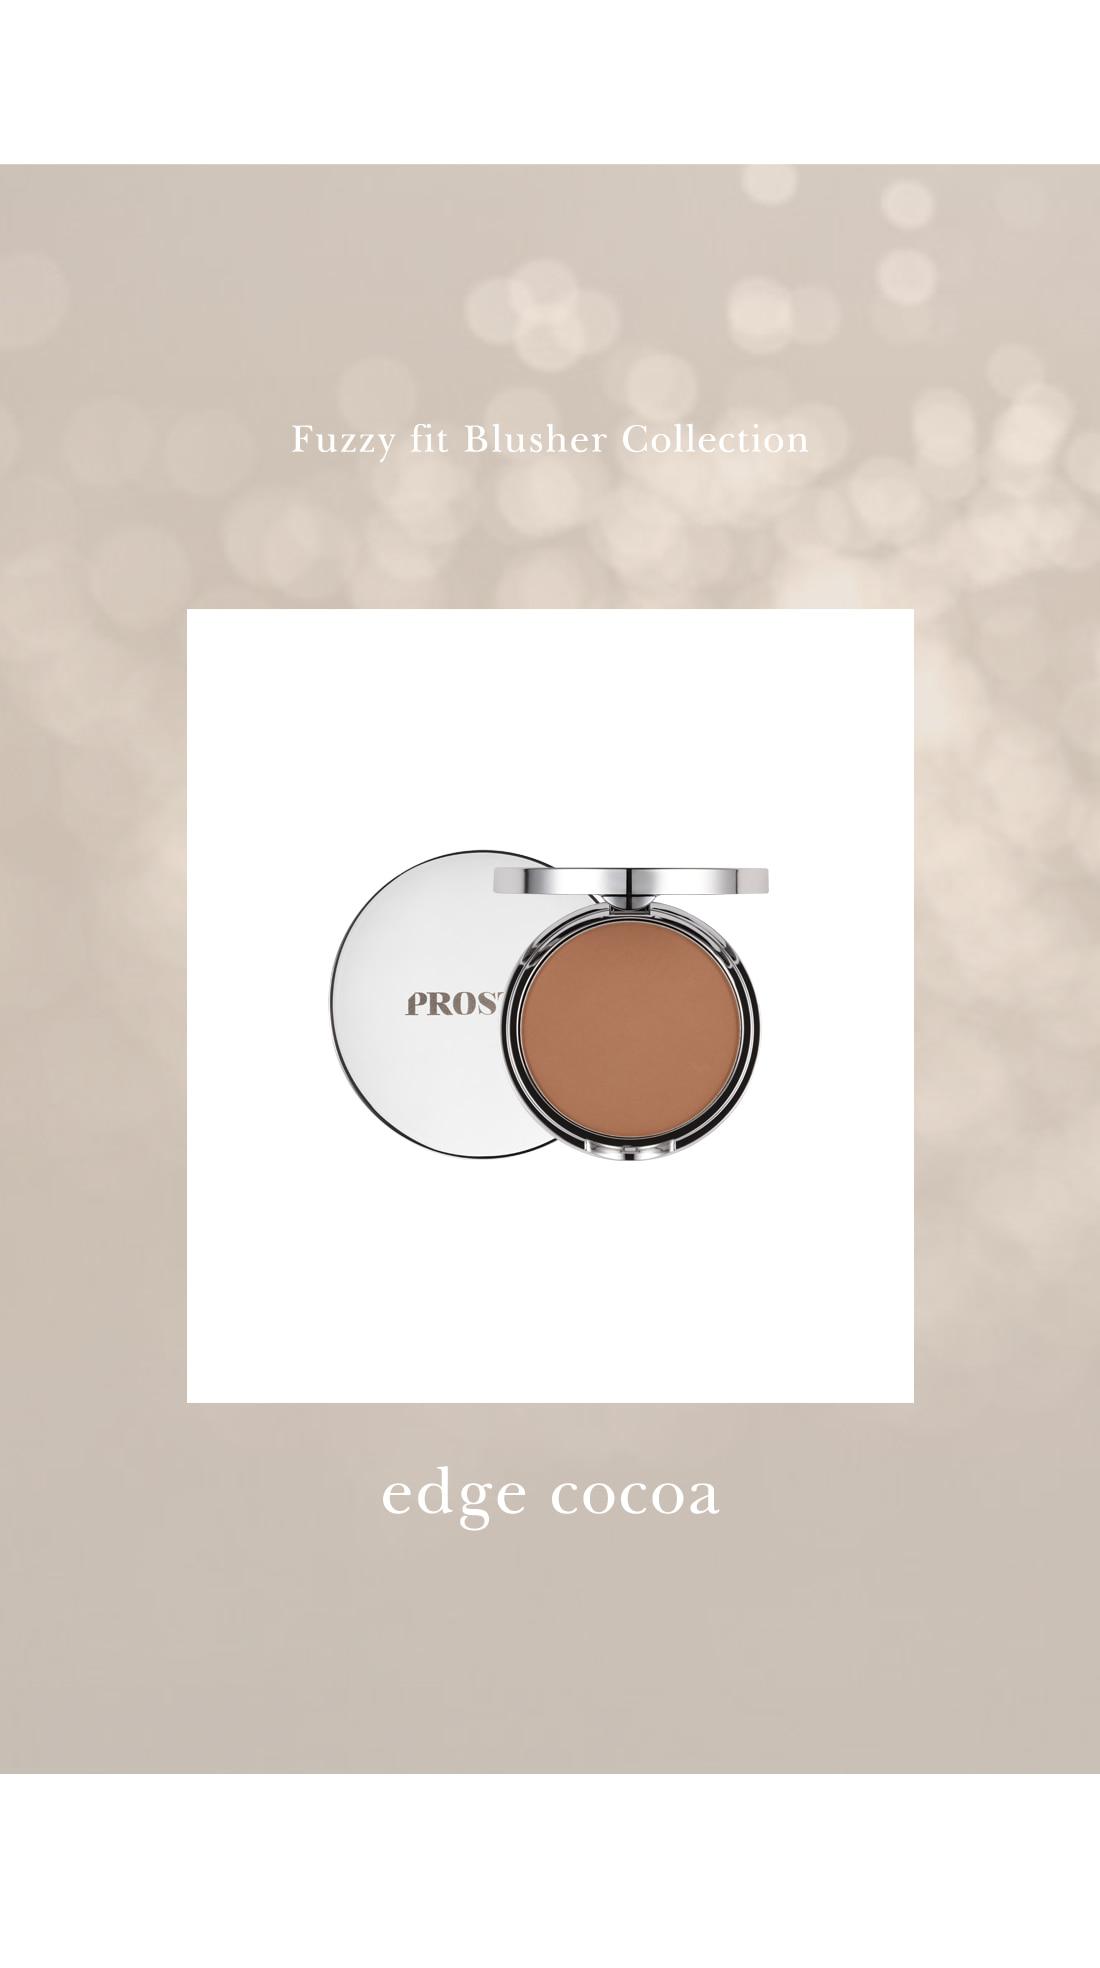 sale) 003 Fuzzy Fit Blusher Edge Cocoa